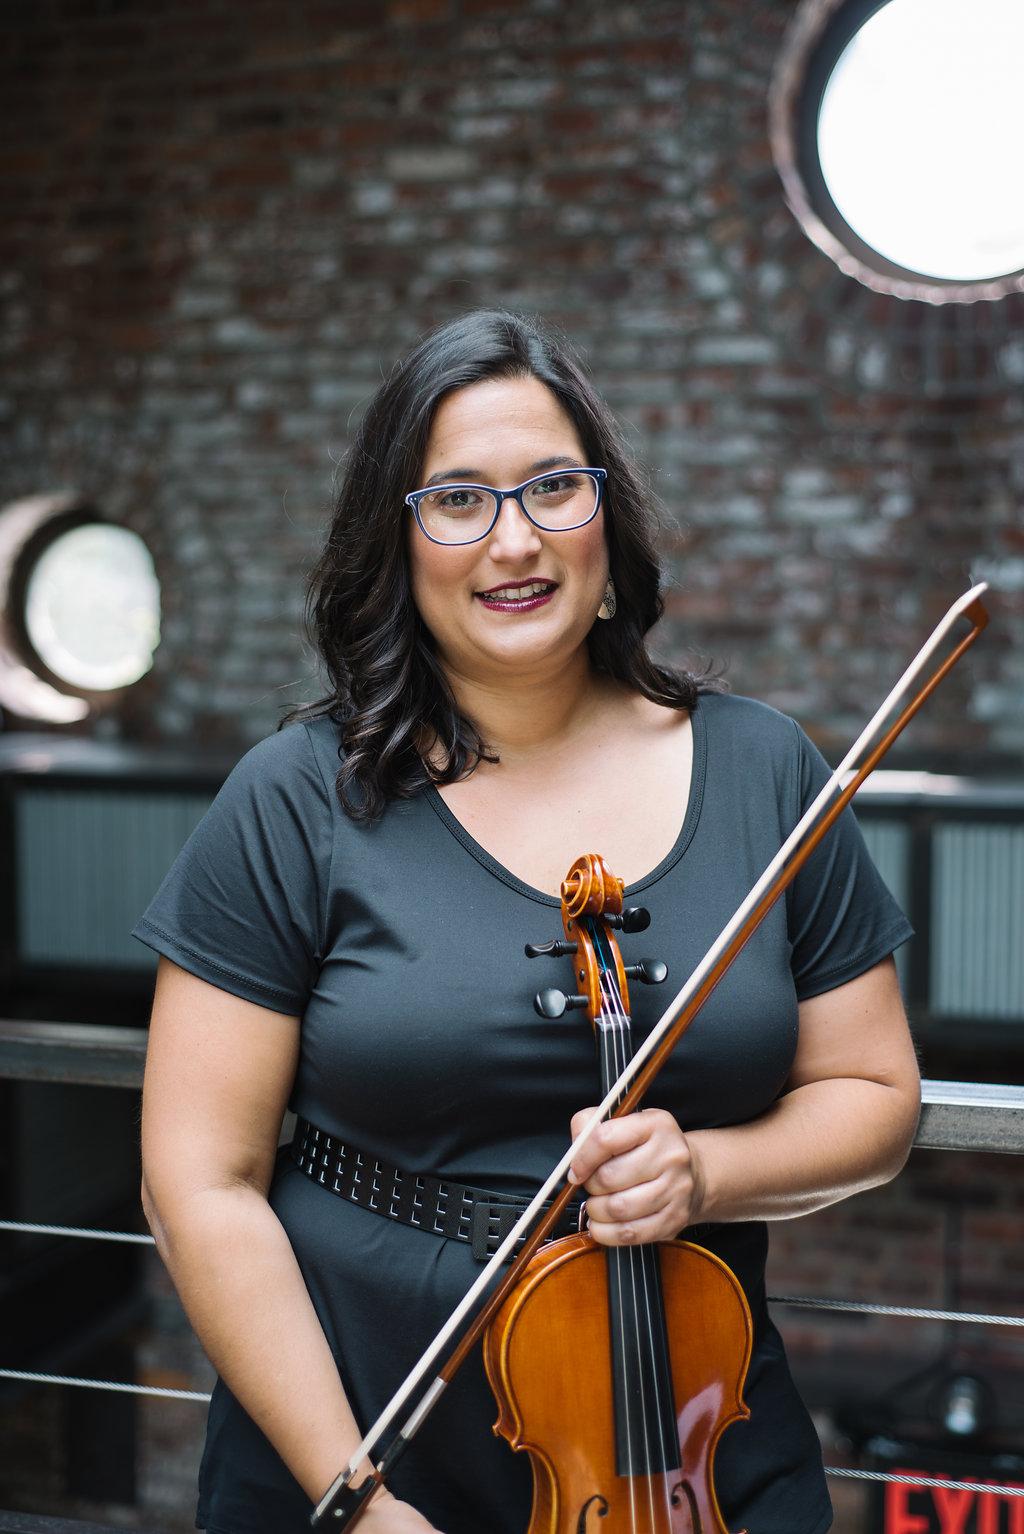 Copy of Cynthia Marcus-Smith - Violin